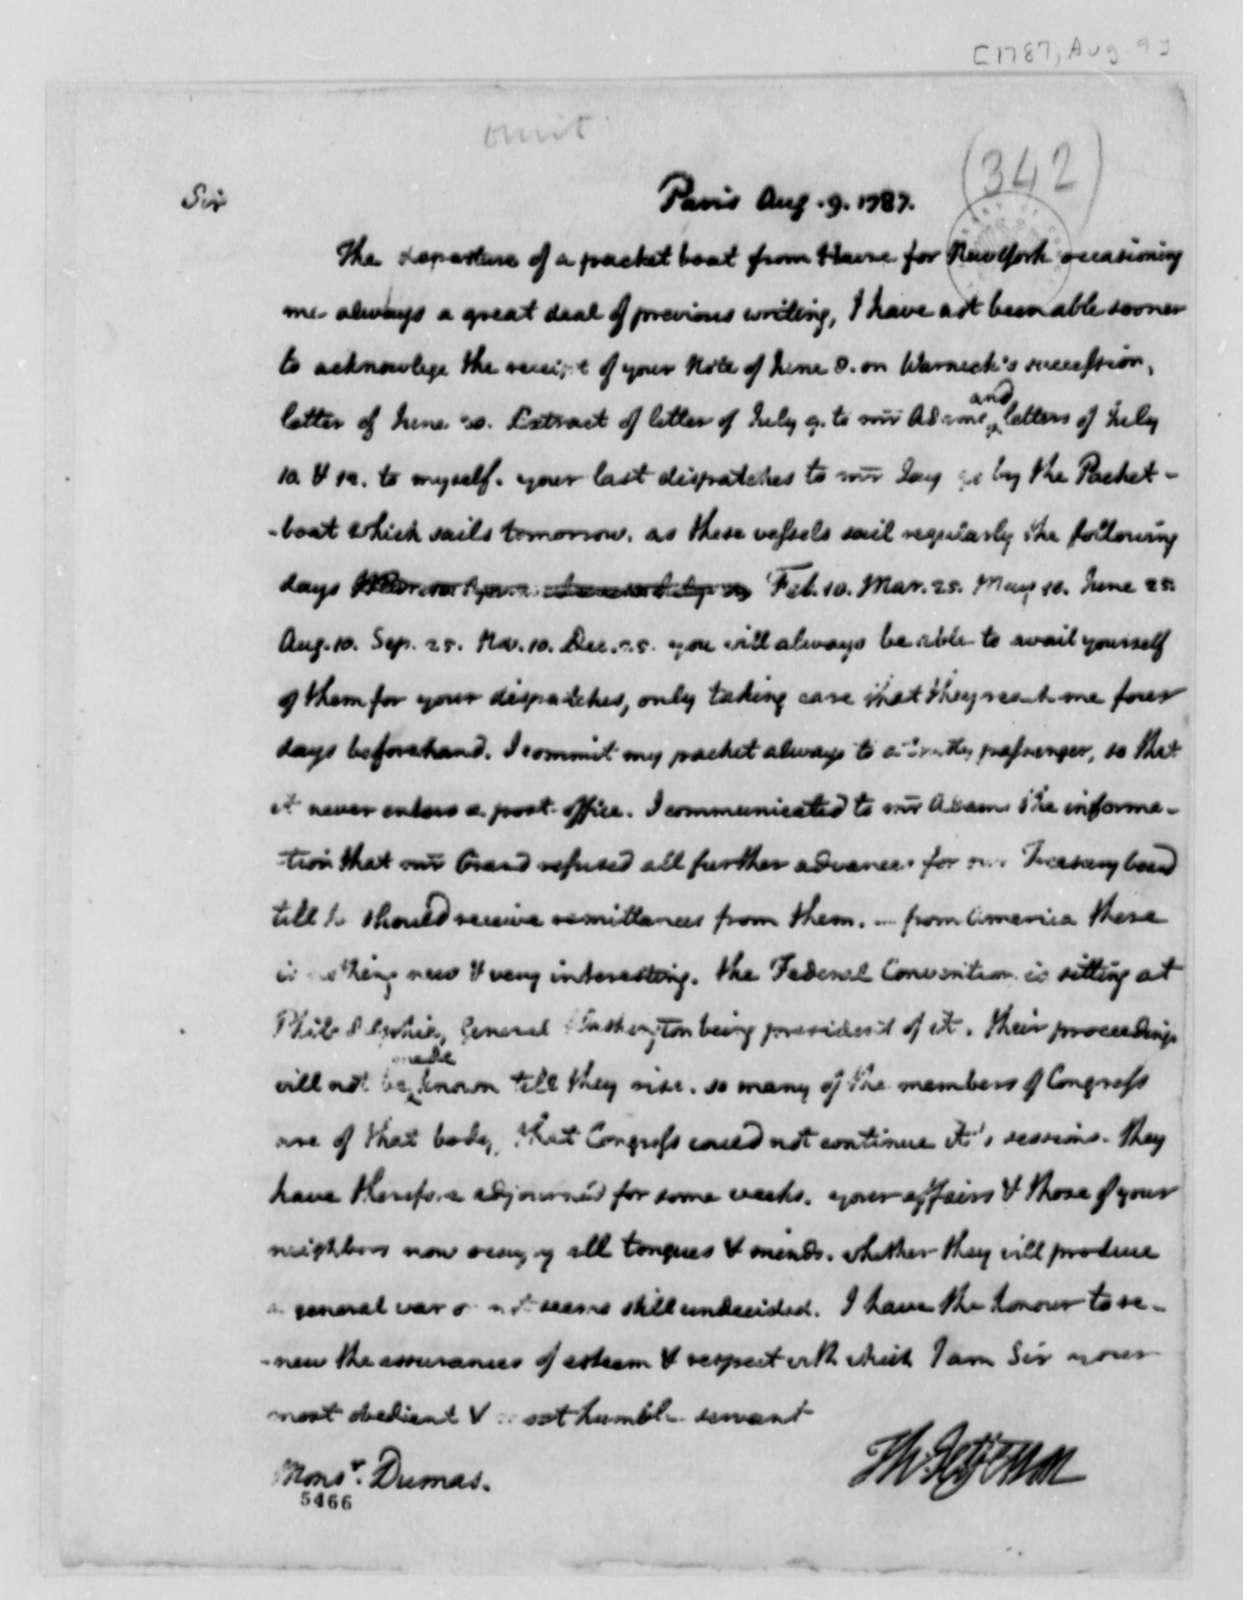 Thomas Jefferson to Charles William Frederic Dumas, August 9, 1787